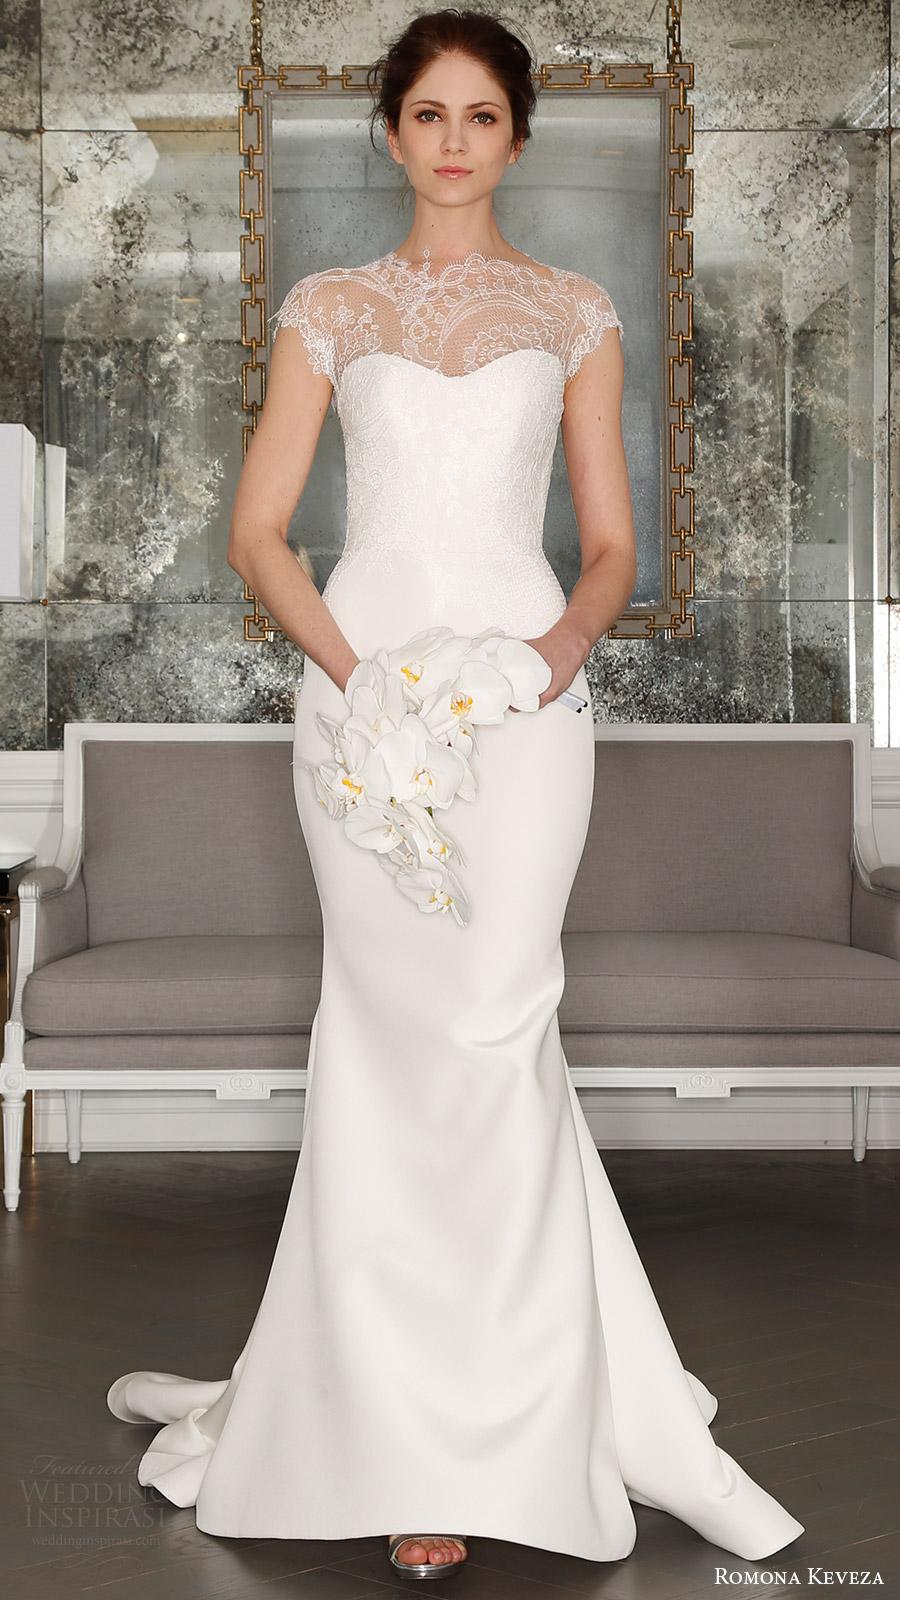 romona keveza bridal spring 2017 cap sleeves sweetheart illusion high neck sheath wedding dress (rk7404) mv